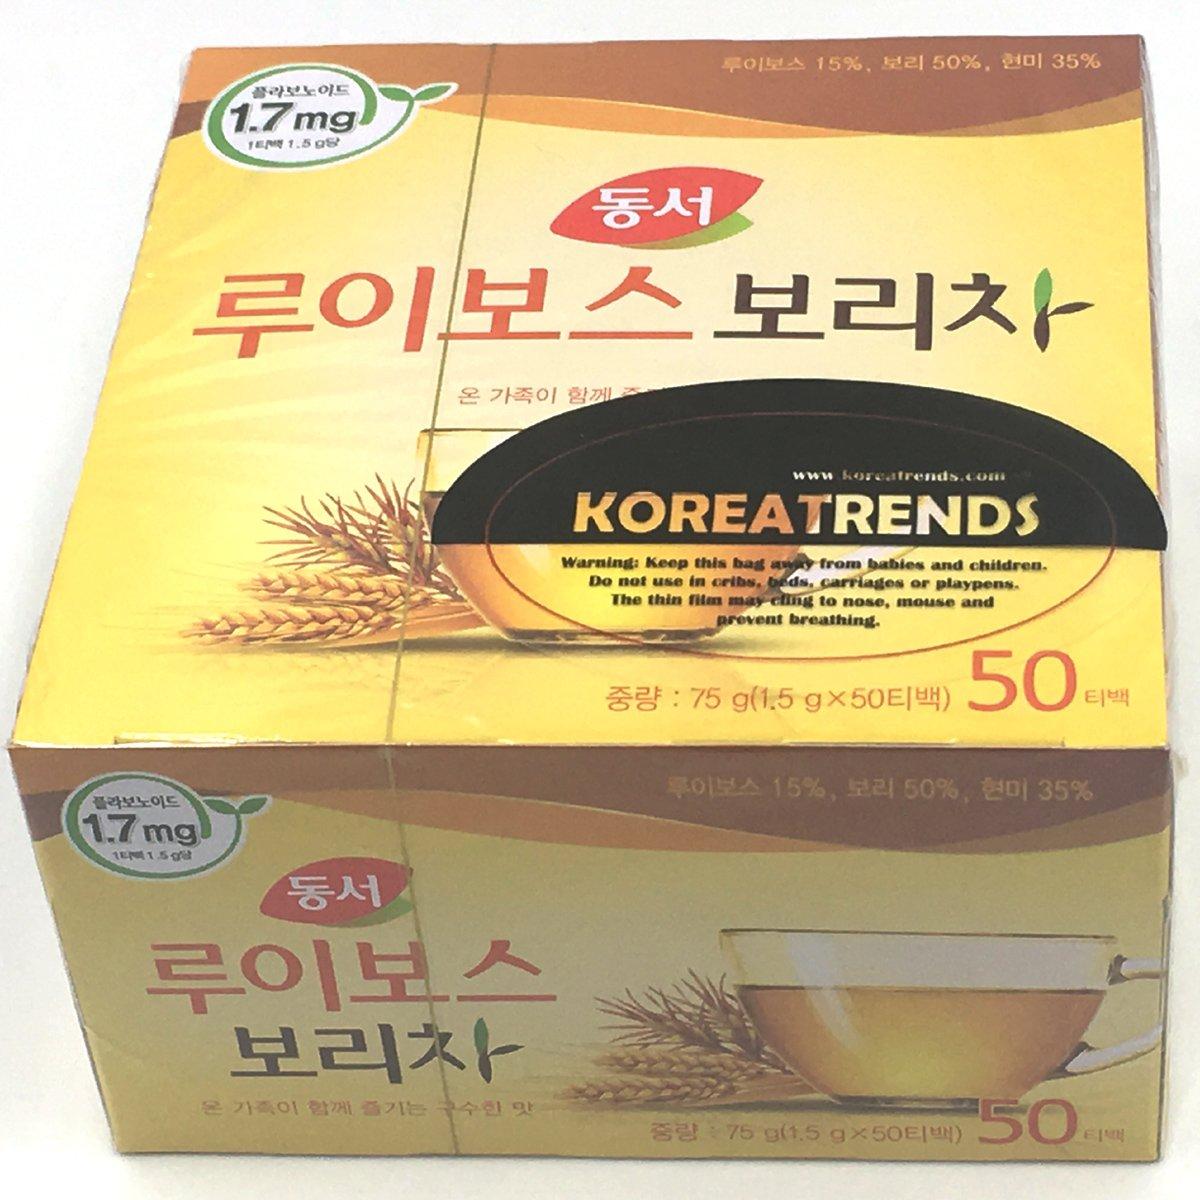 Dongsuh Food Rooibos Roasted Barley Tea 75g (1.5 g x 50 bags) by Dongsuh Food (Image #1)